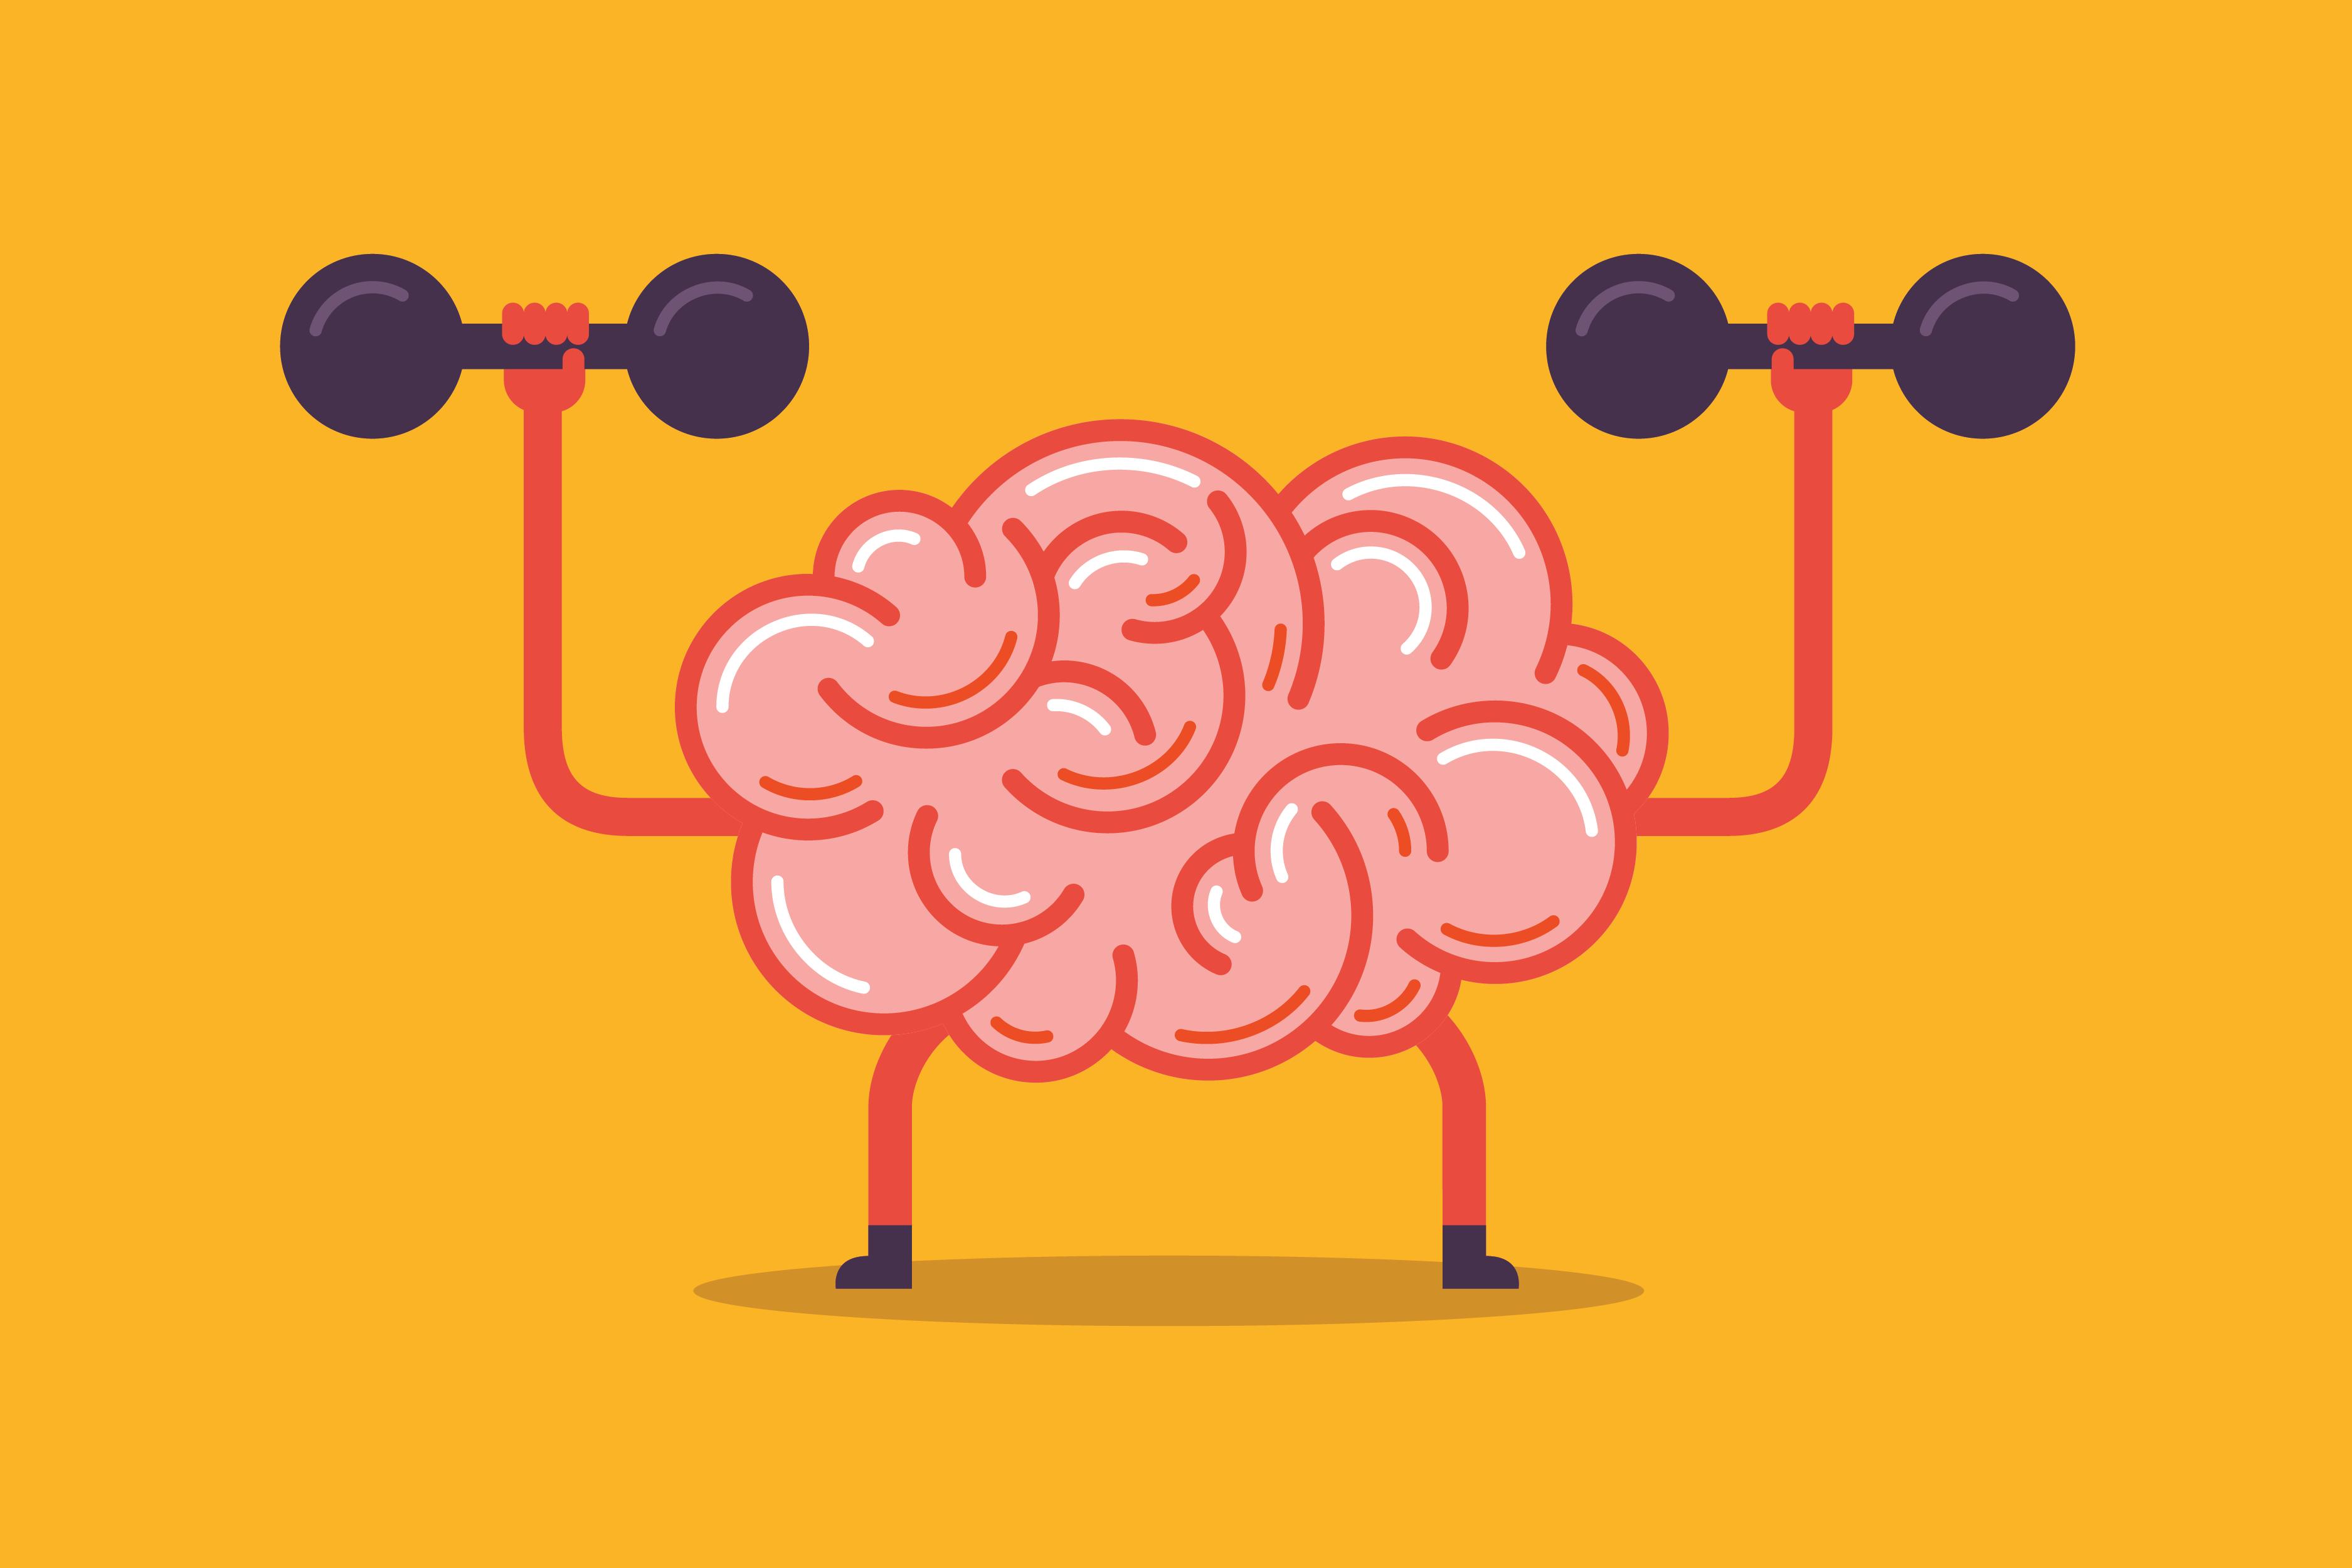 A cartoon brain lifting weights.